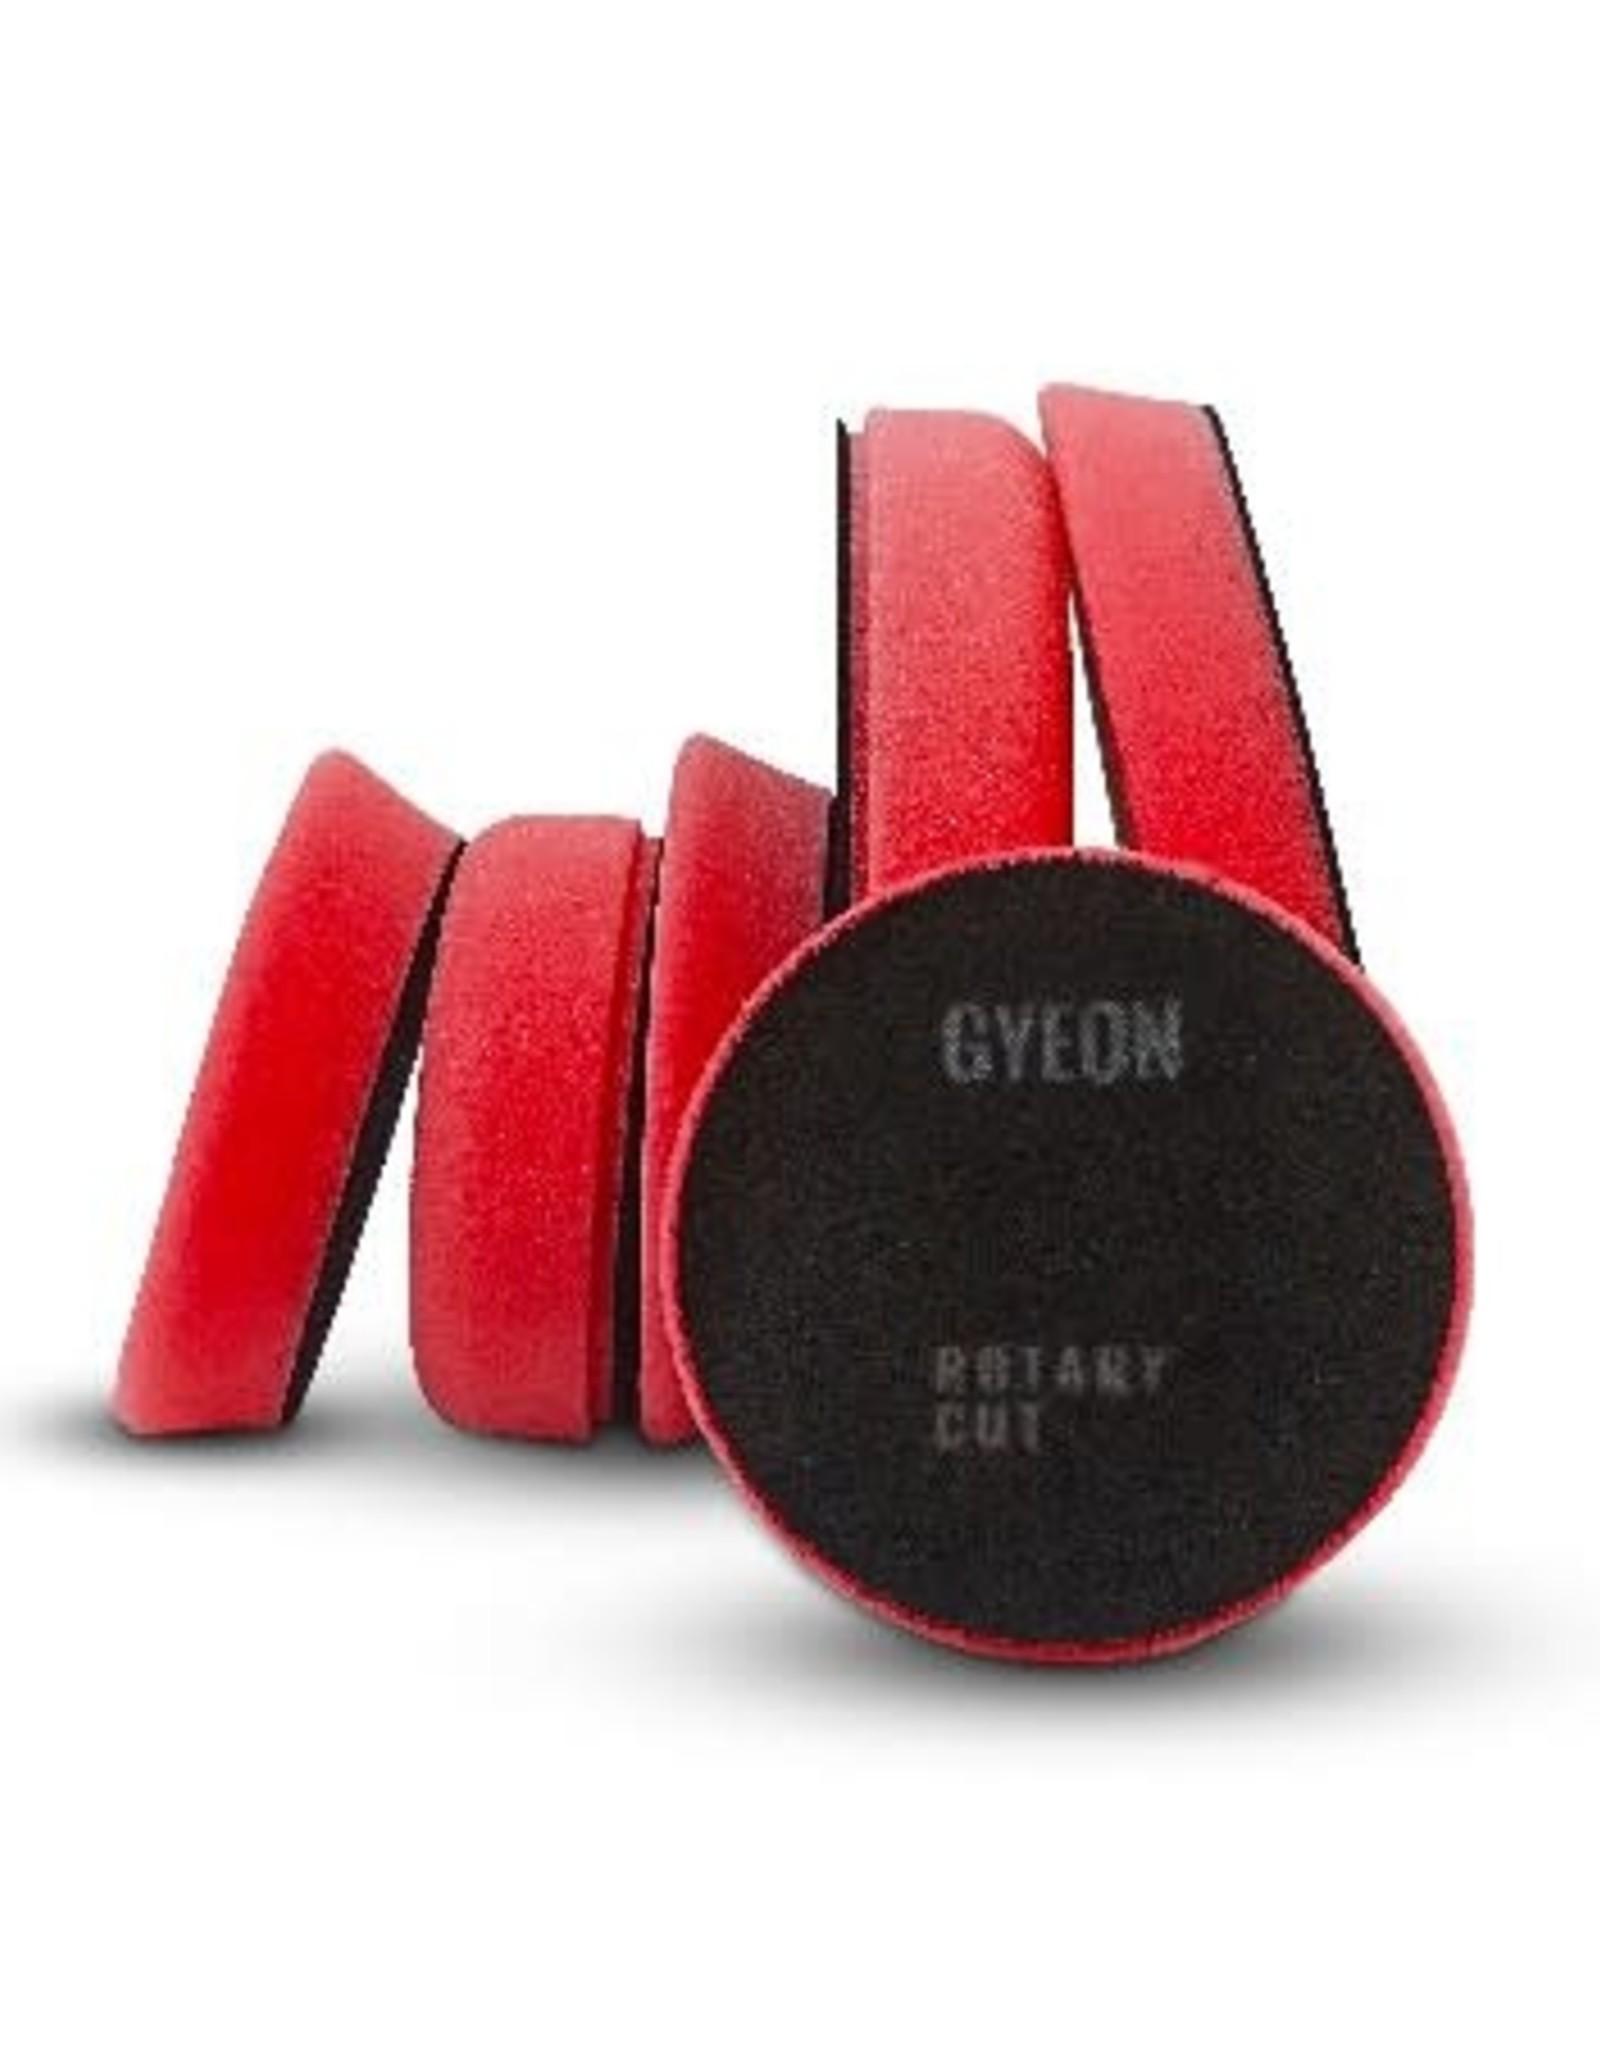 Gyeon Gyeon Q²M Rotary Cut 2-pack  80mm x 25mm